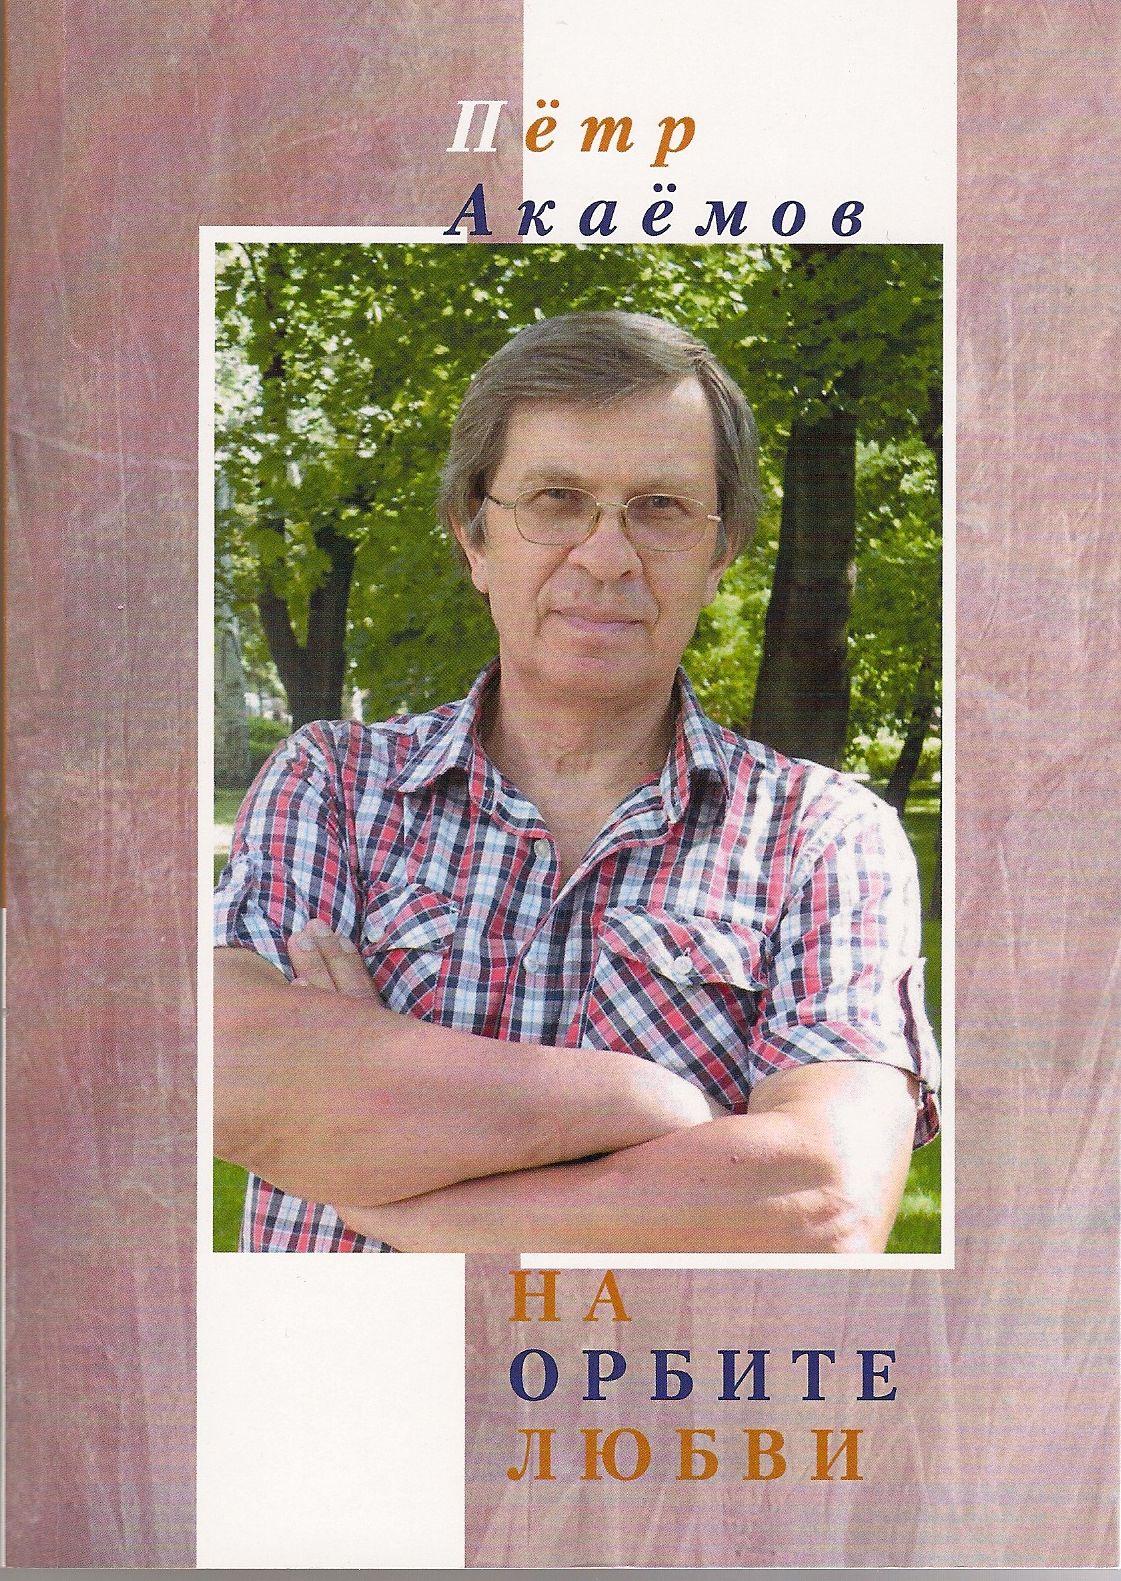 Пётр Акаёмов. «На орбите любви» - М.: «У Никитских ворот», 2013.